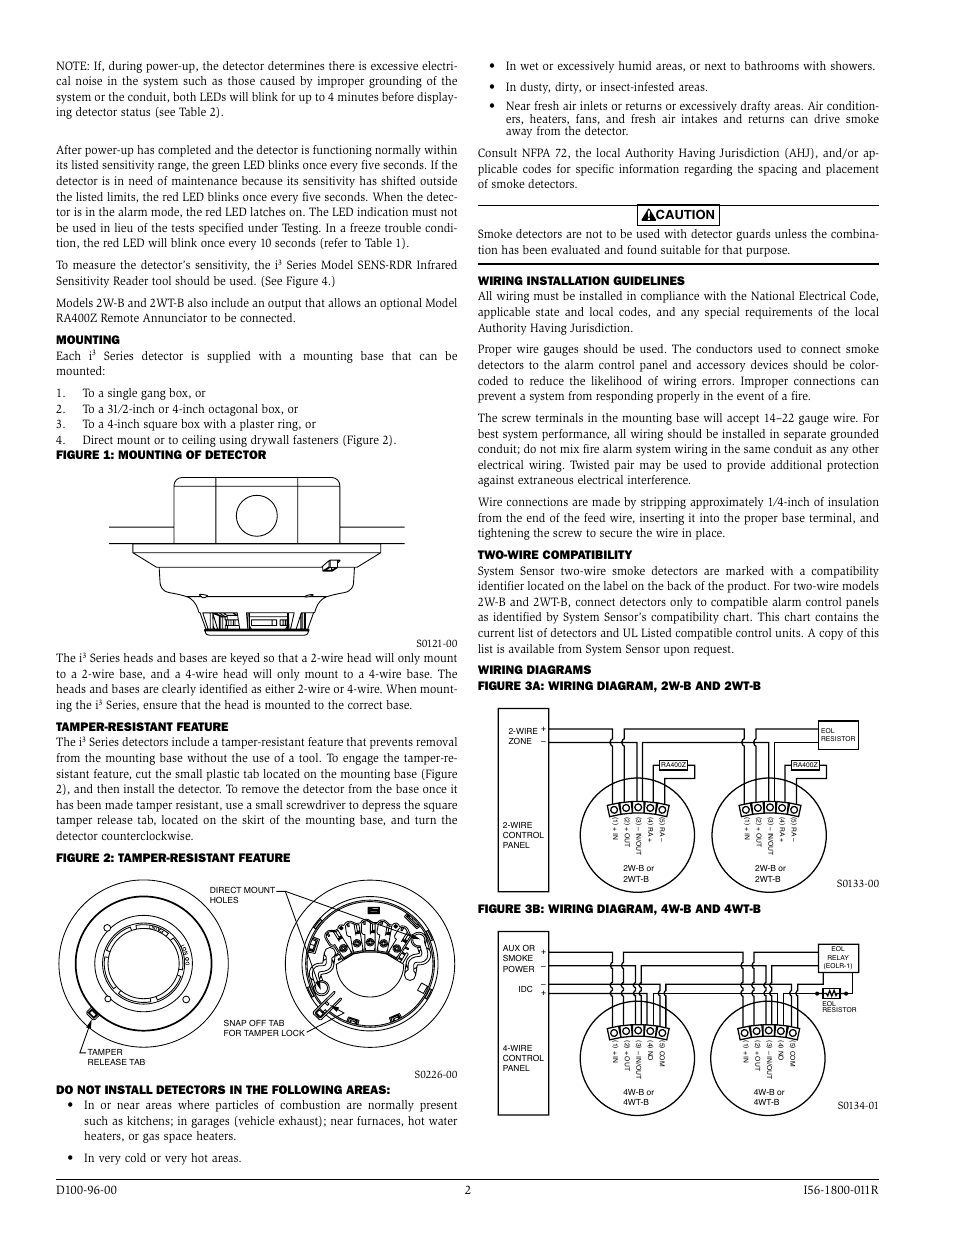 Contemporary Smoke Detector Interconnect Wiring Diagram Crest ...